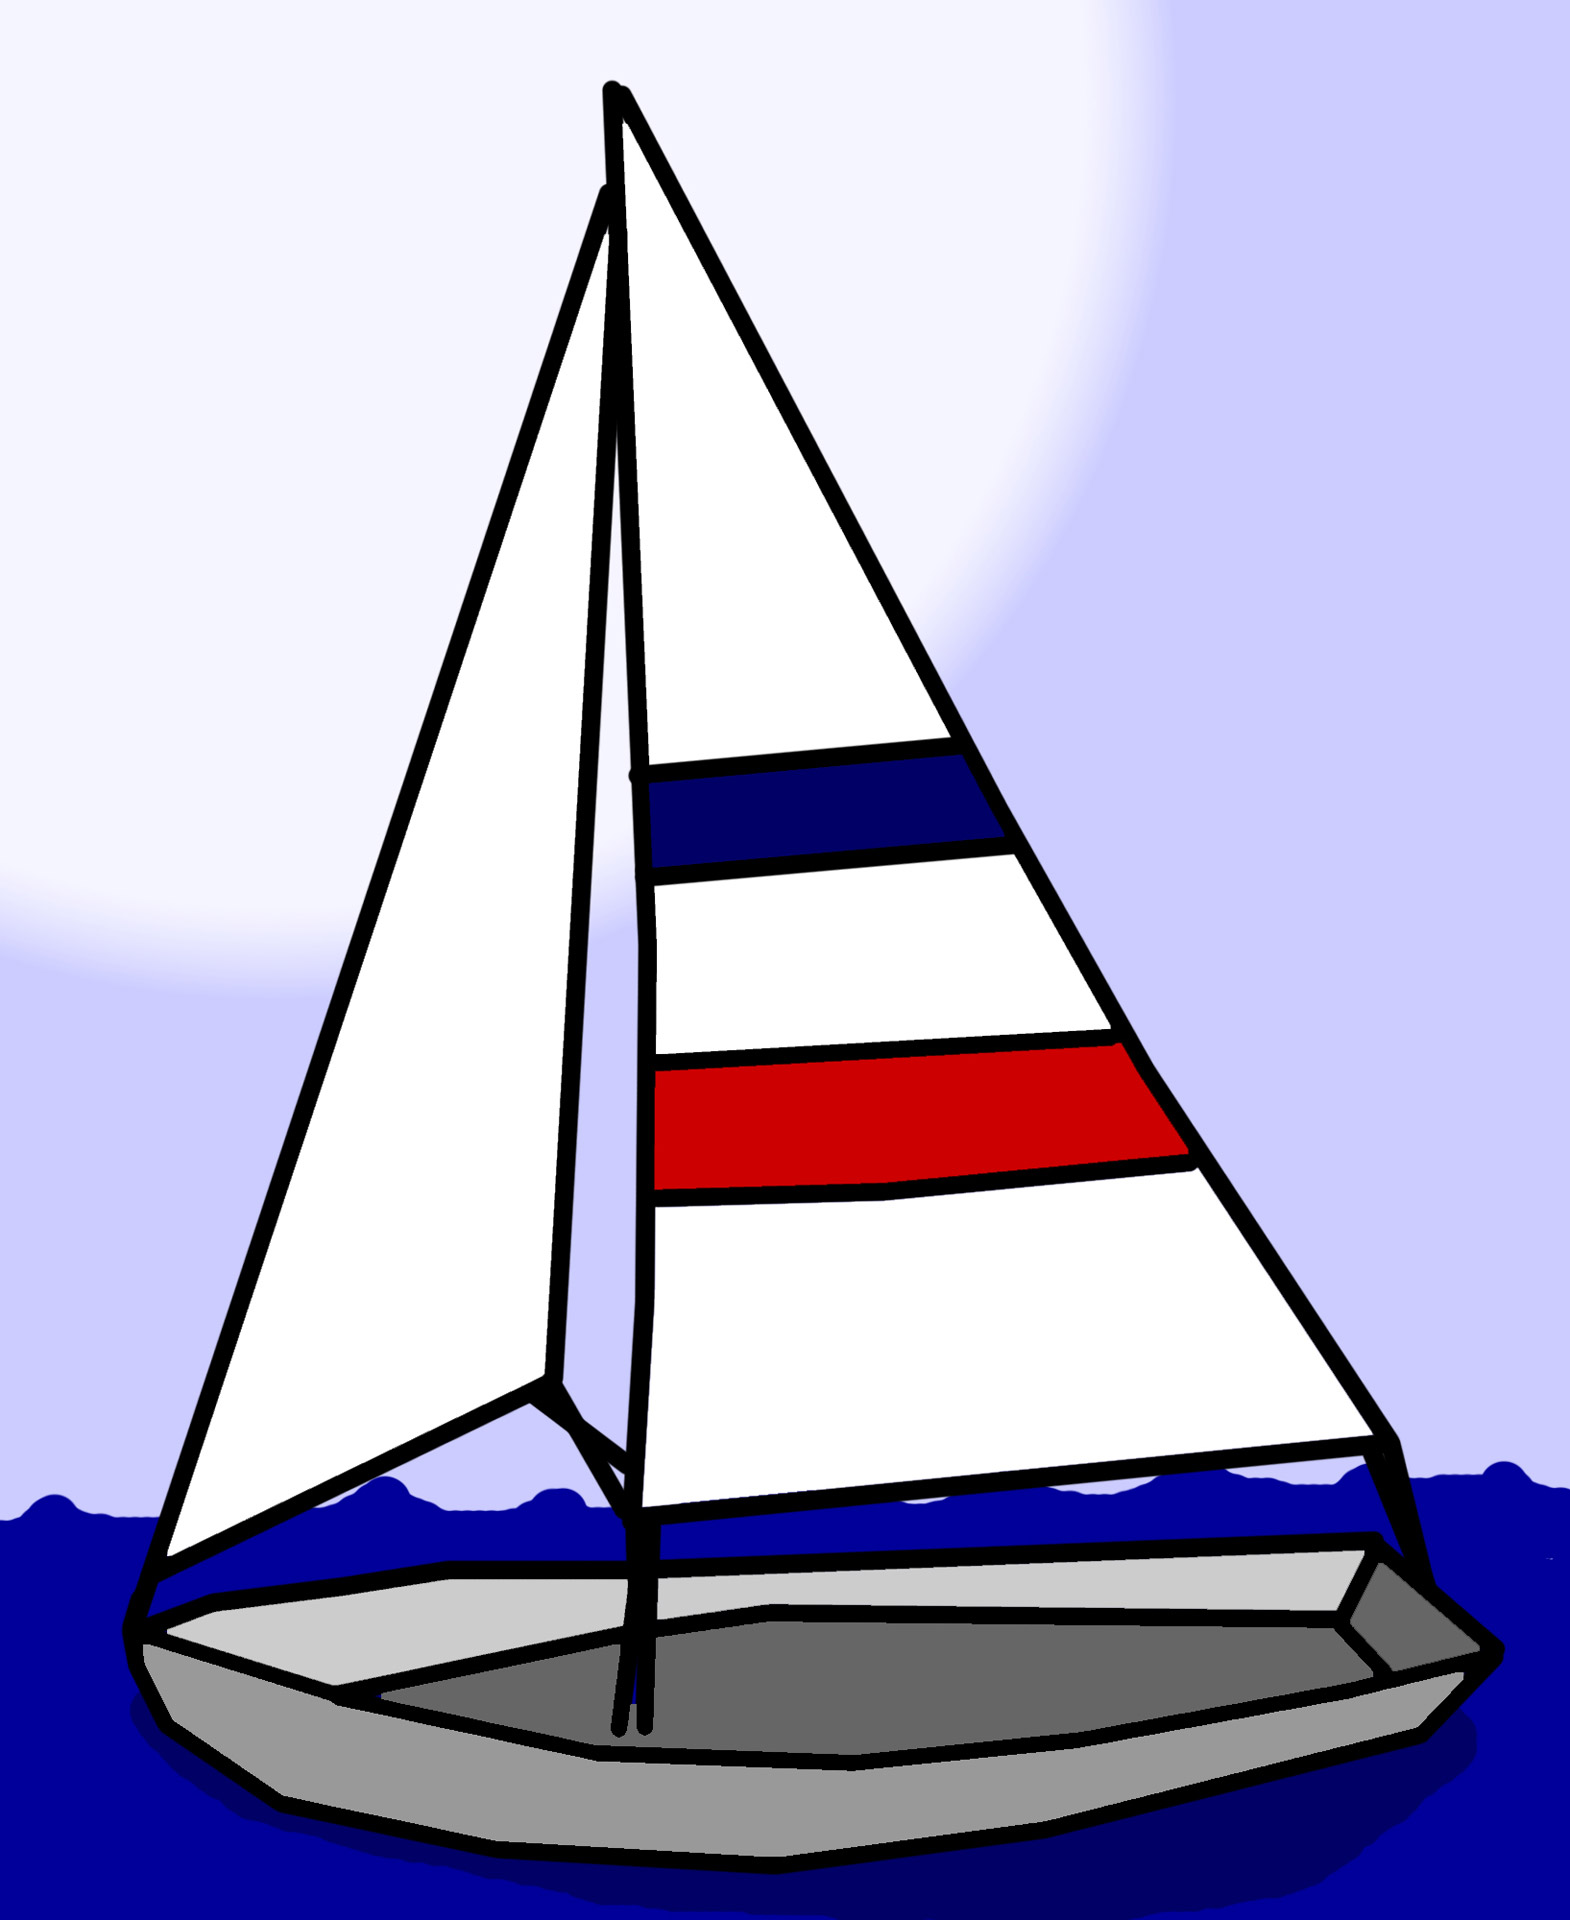 Cartoon Sail Boat - ClipArt Best